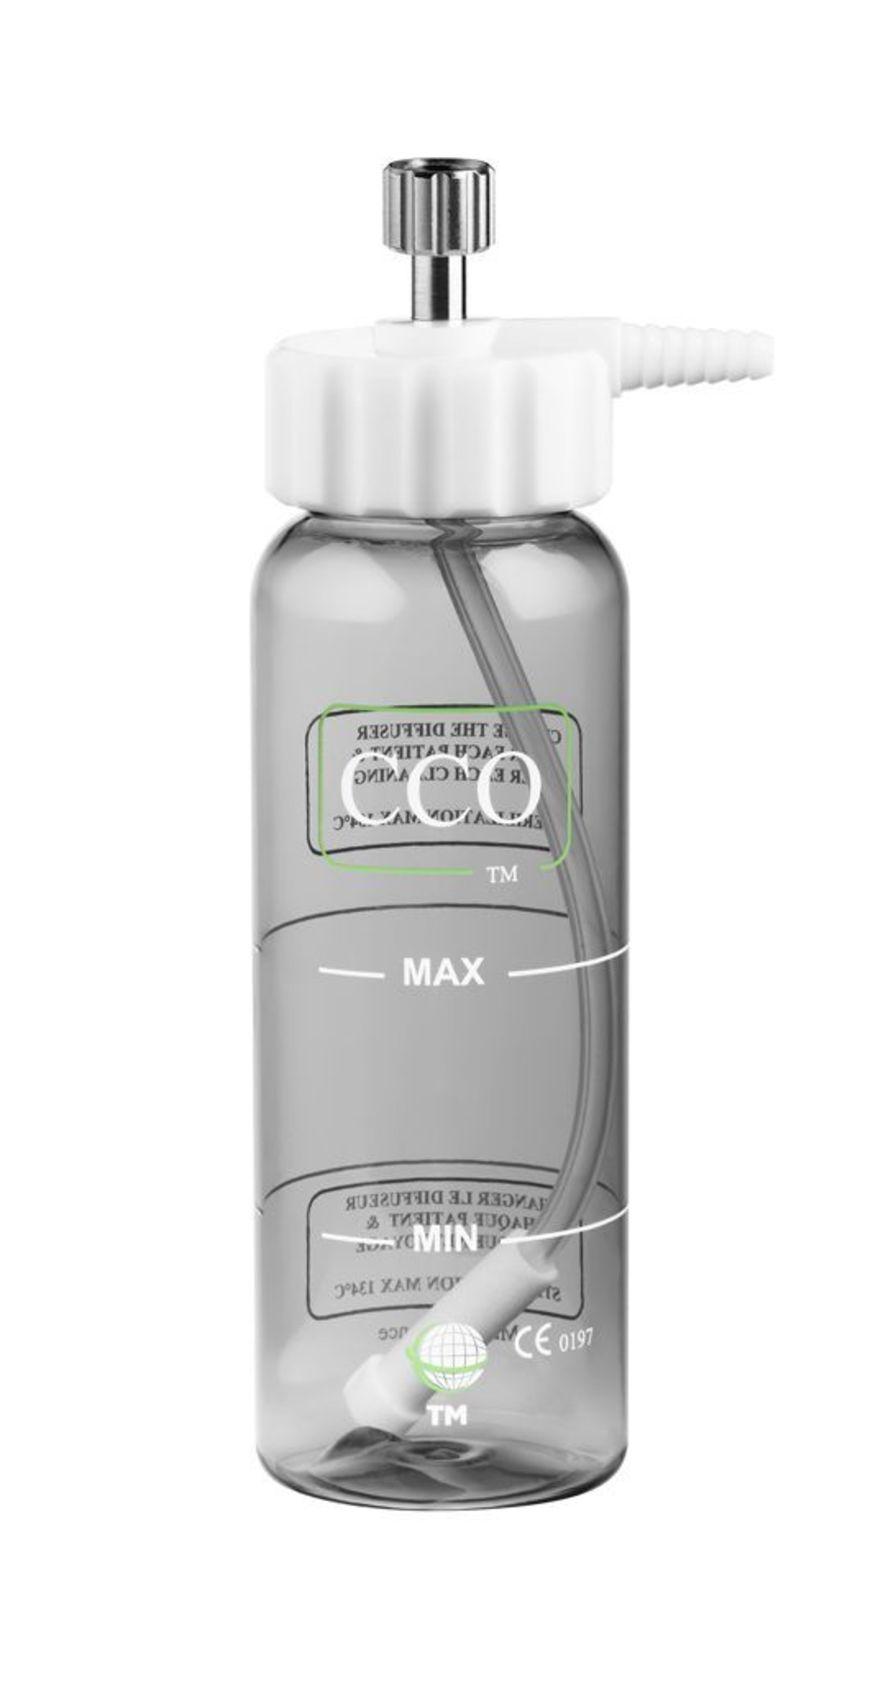 Bubble humidifier 250 mL | CCO Technologie Medicale